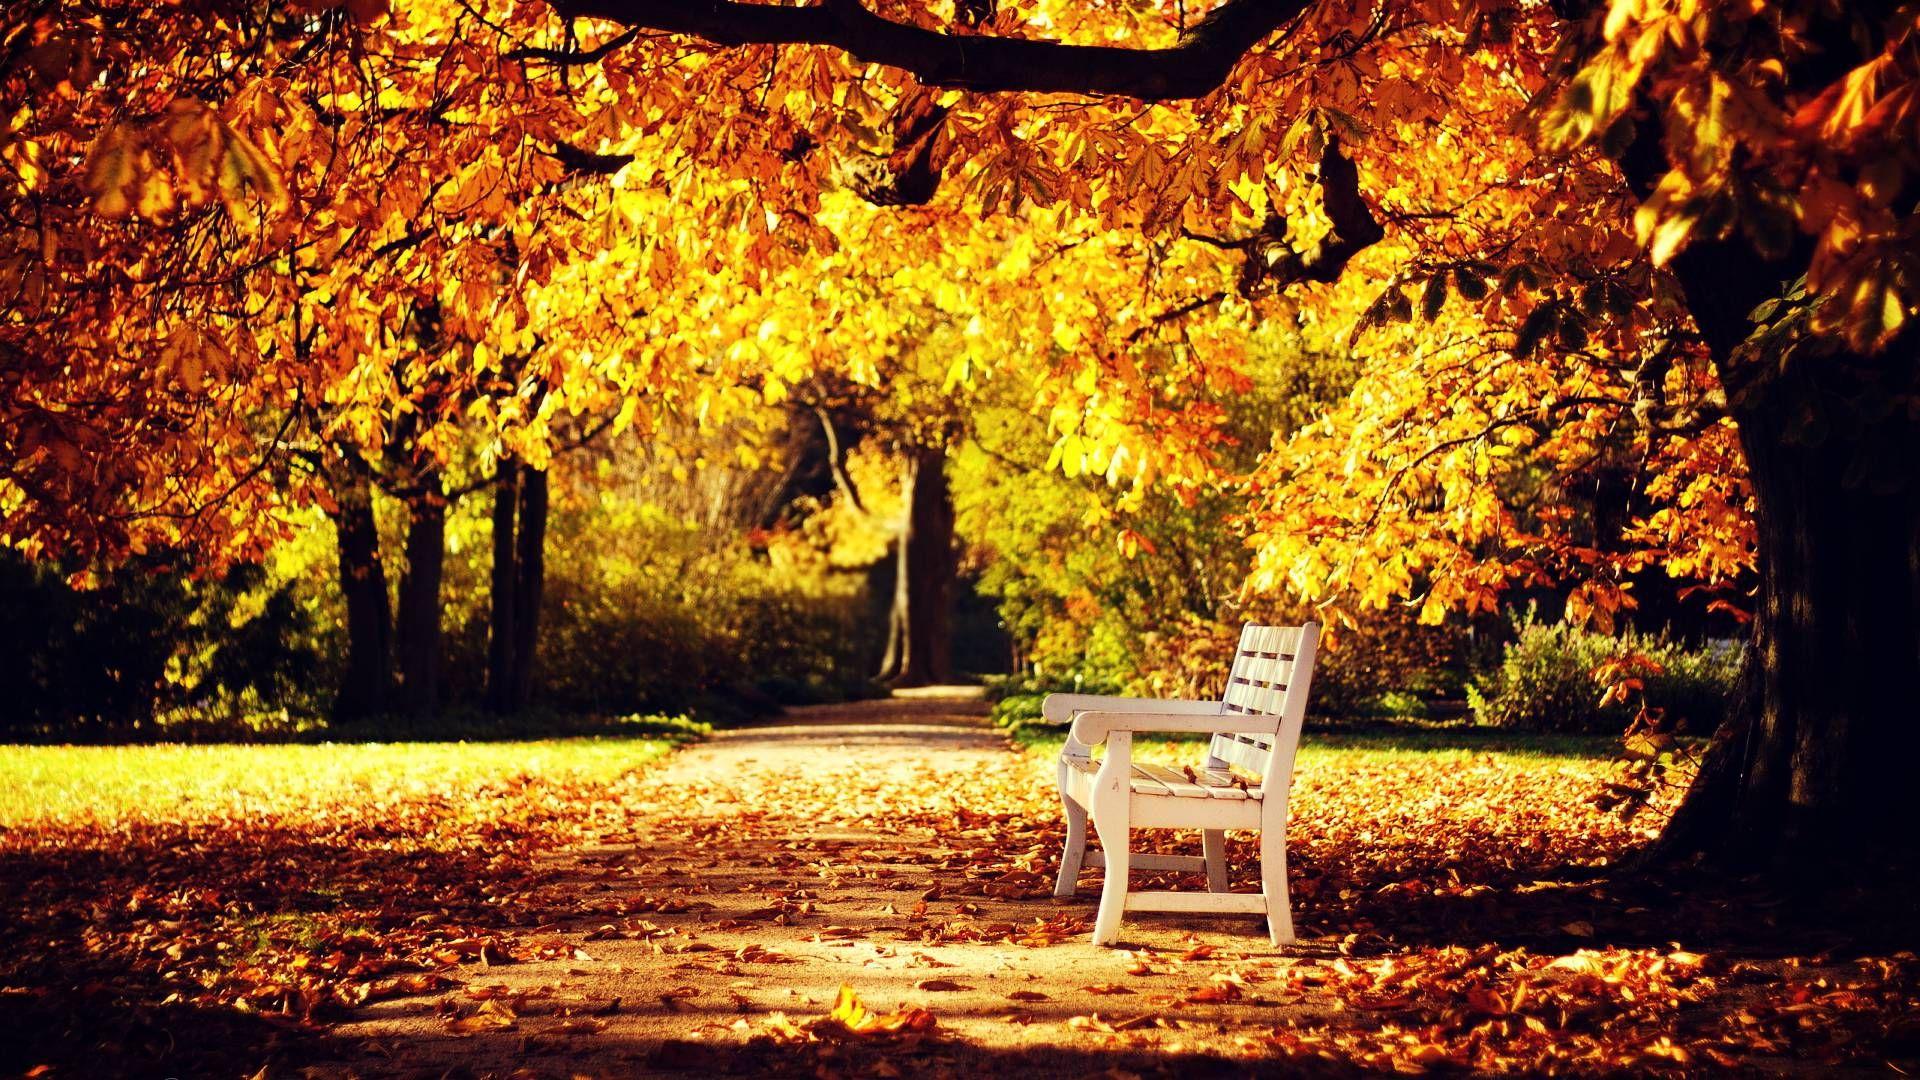 Autumn Wallpaper Fall HD Backgrounds 1680×1050 Autumn Pics